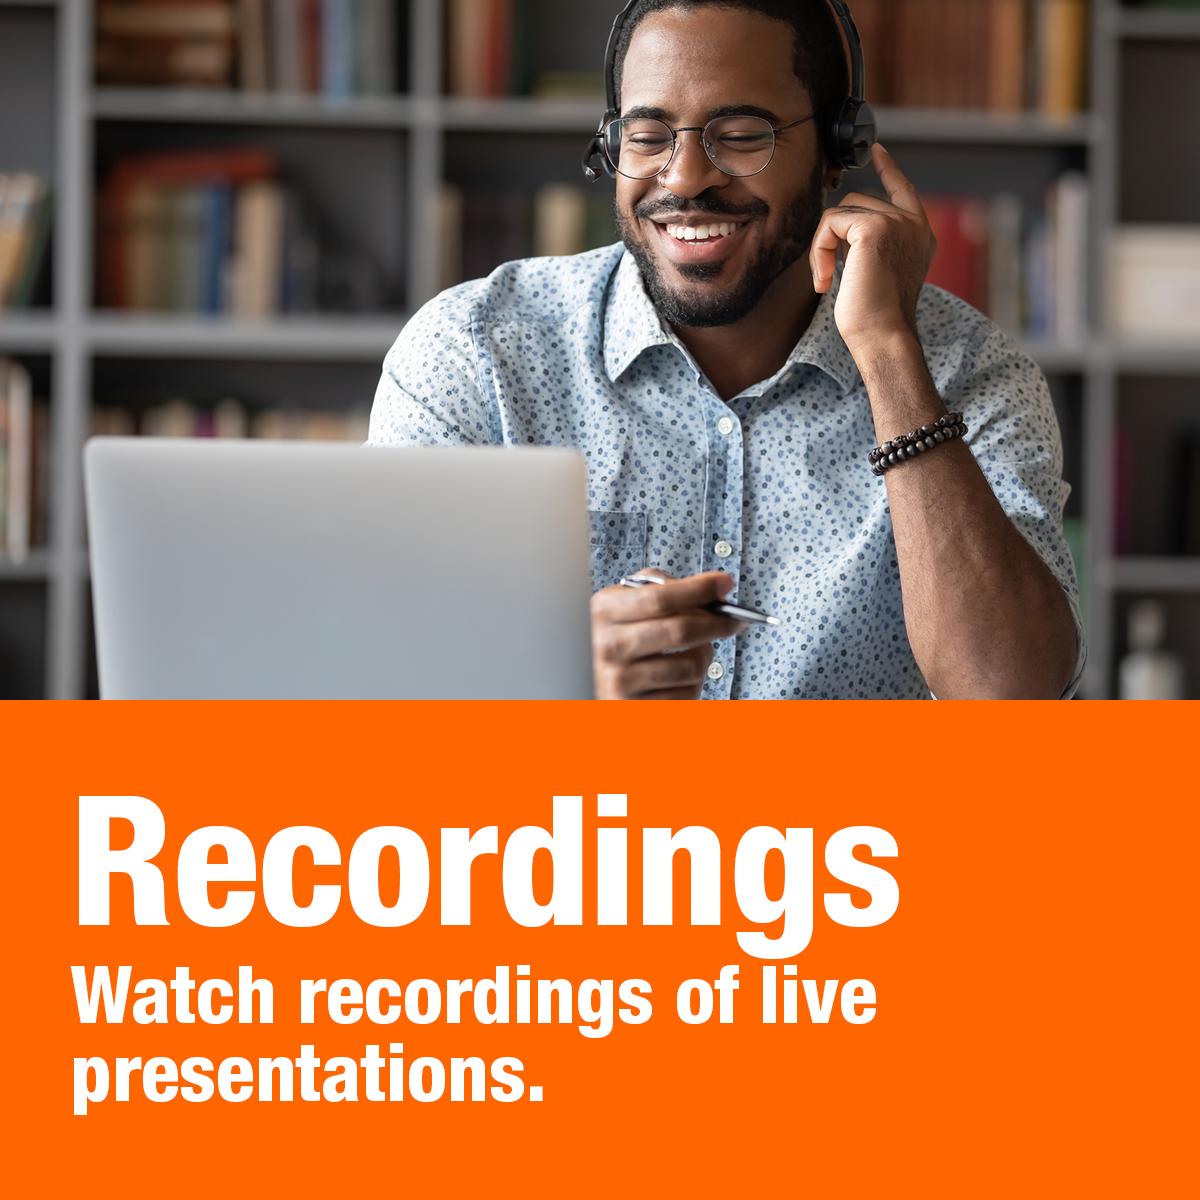 Watch recordings